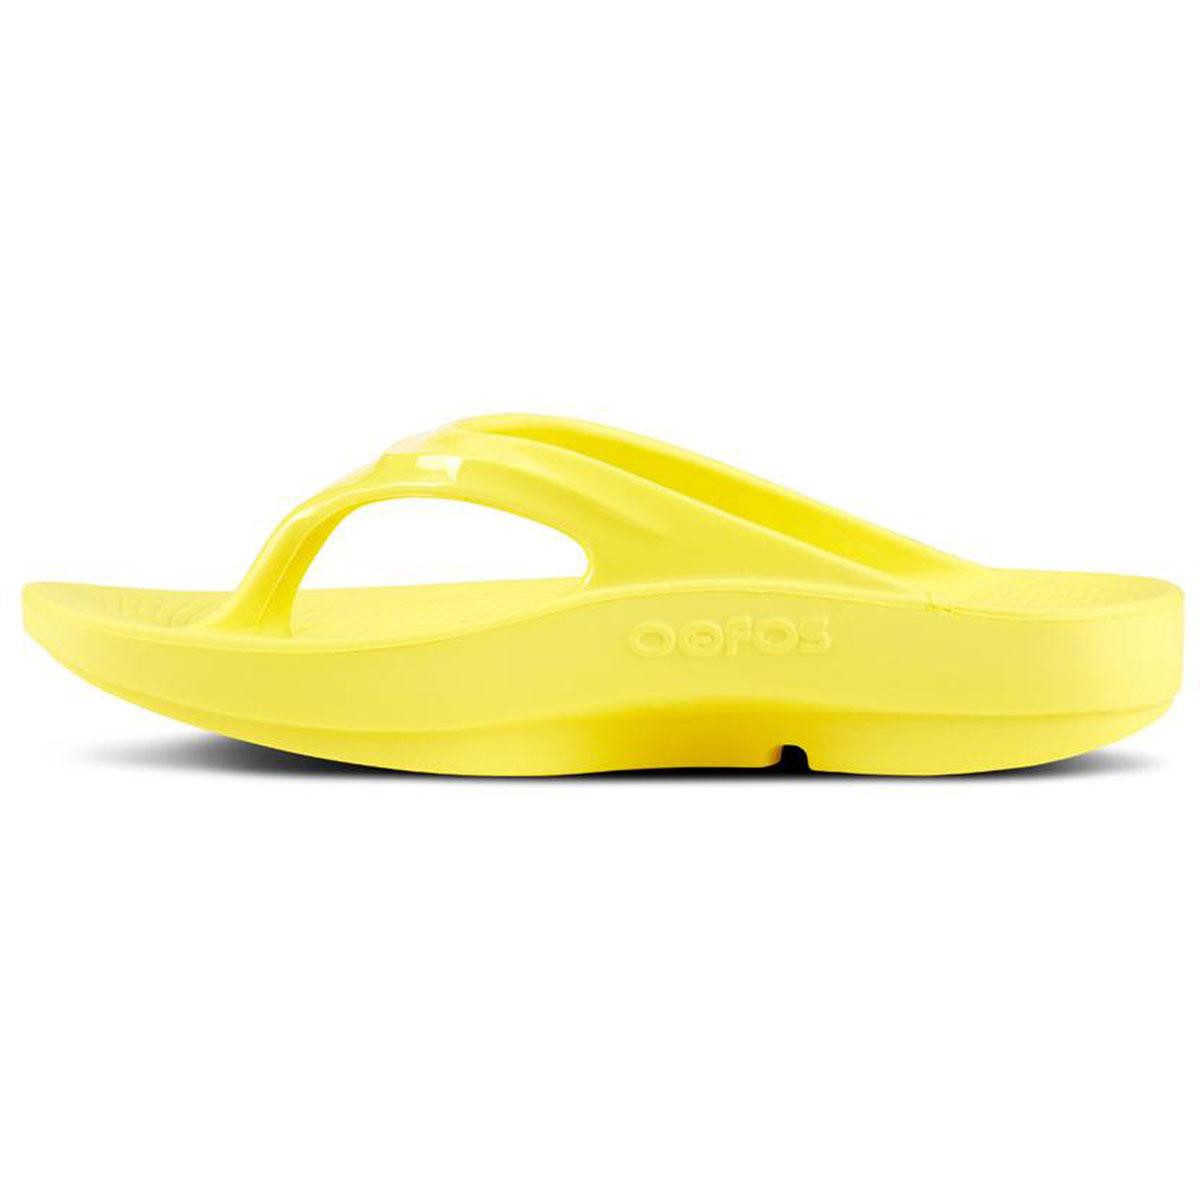 Women's Oofos OOlala Thong Recovery Sandal - Color: Lemon - Size: 5 - Width: Regular, Lemon, large, image 2